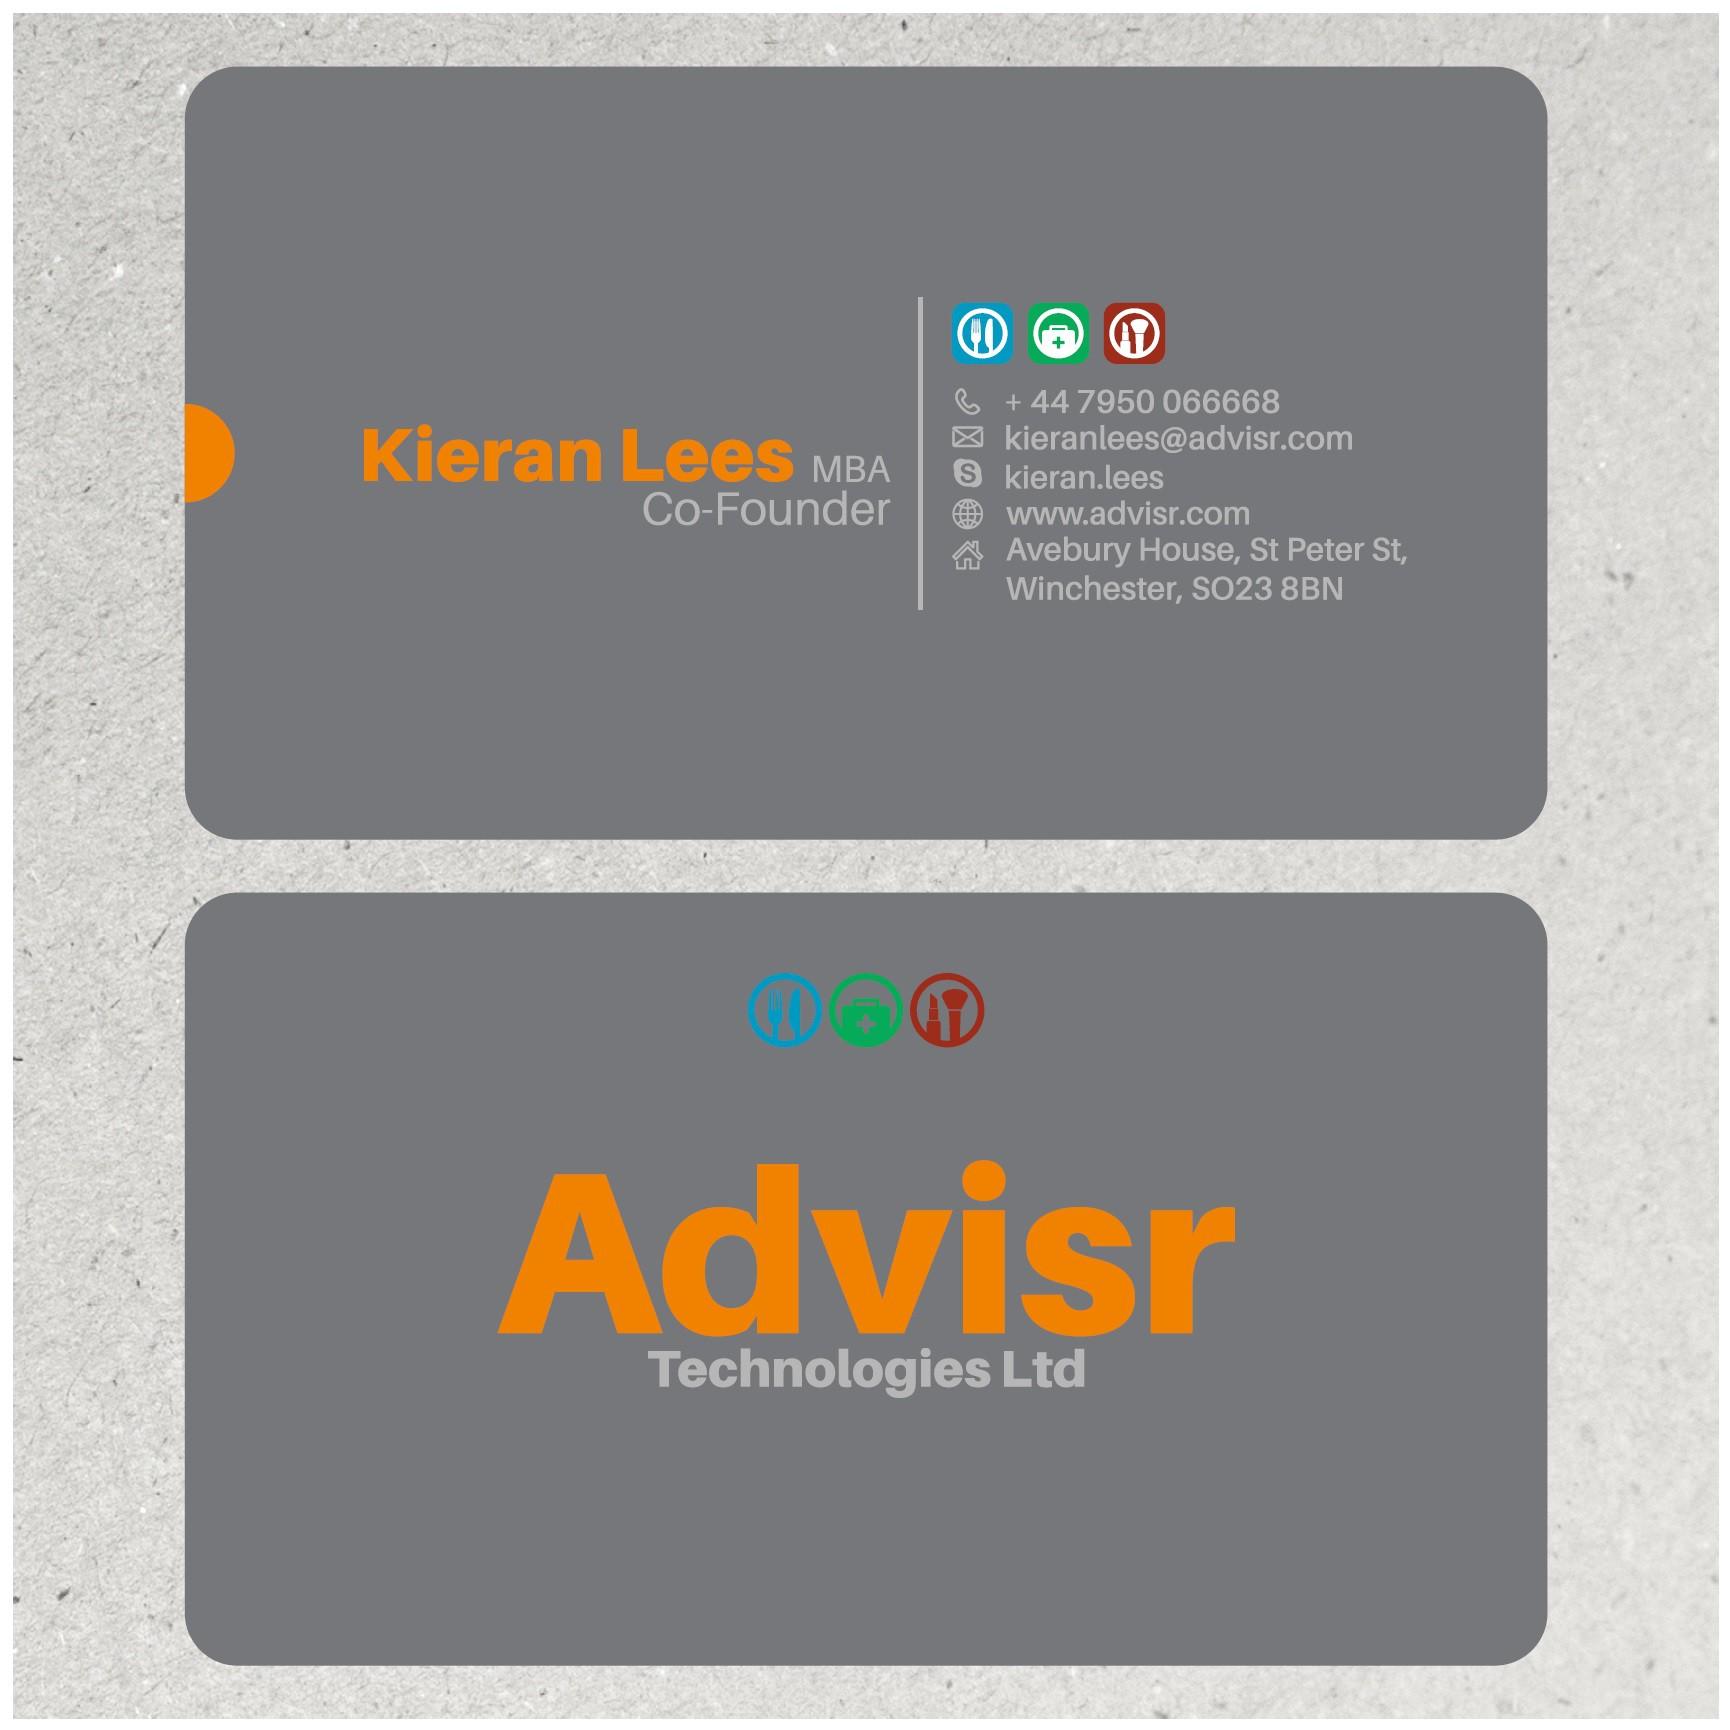 Advisr Technologies Limited